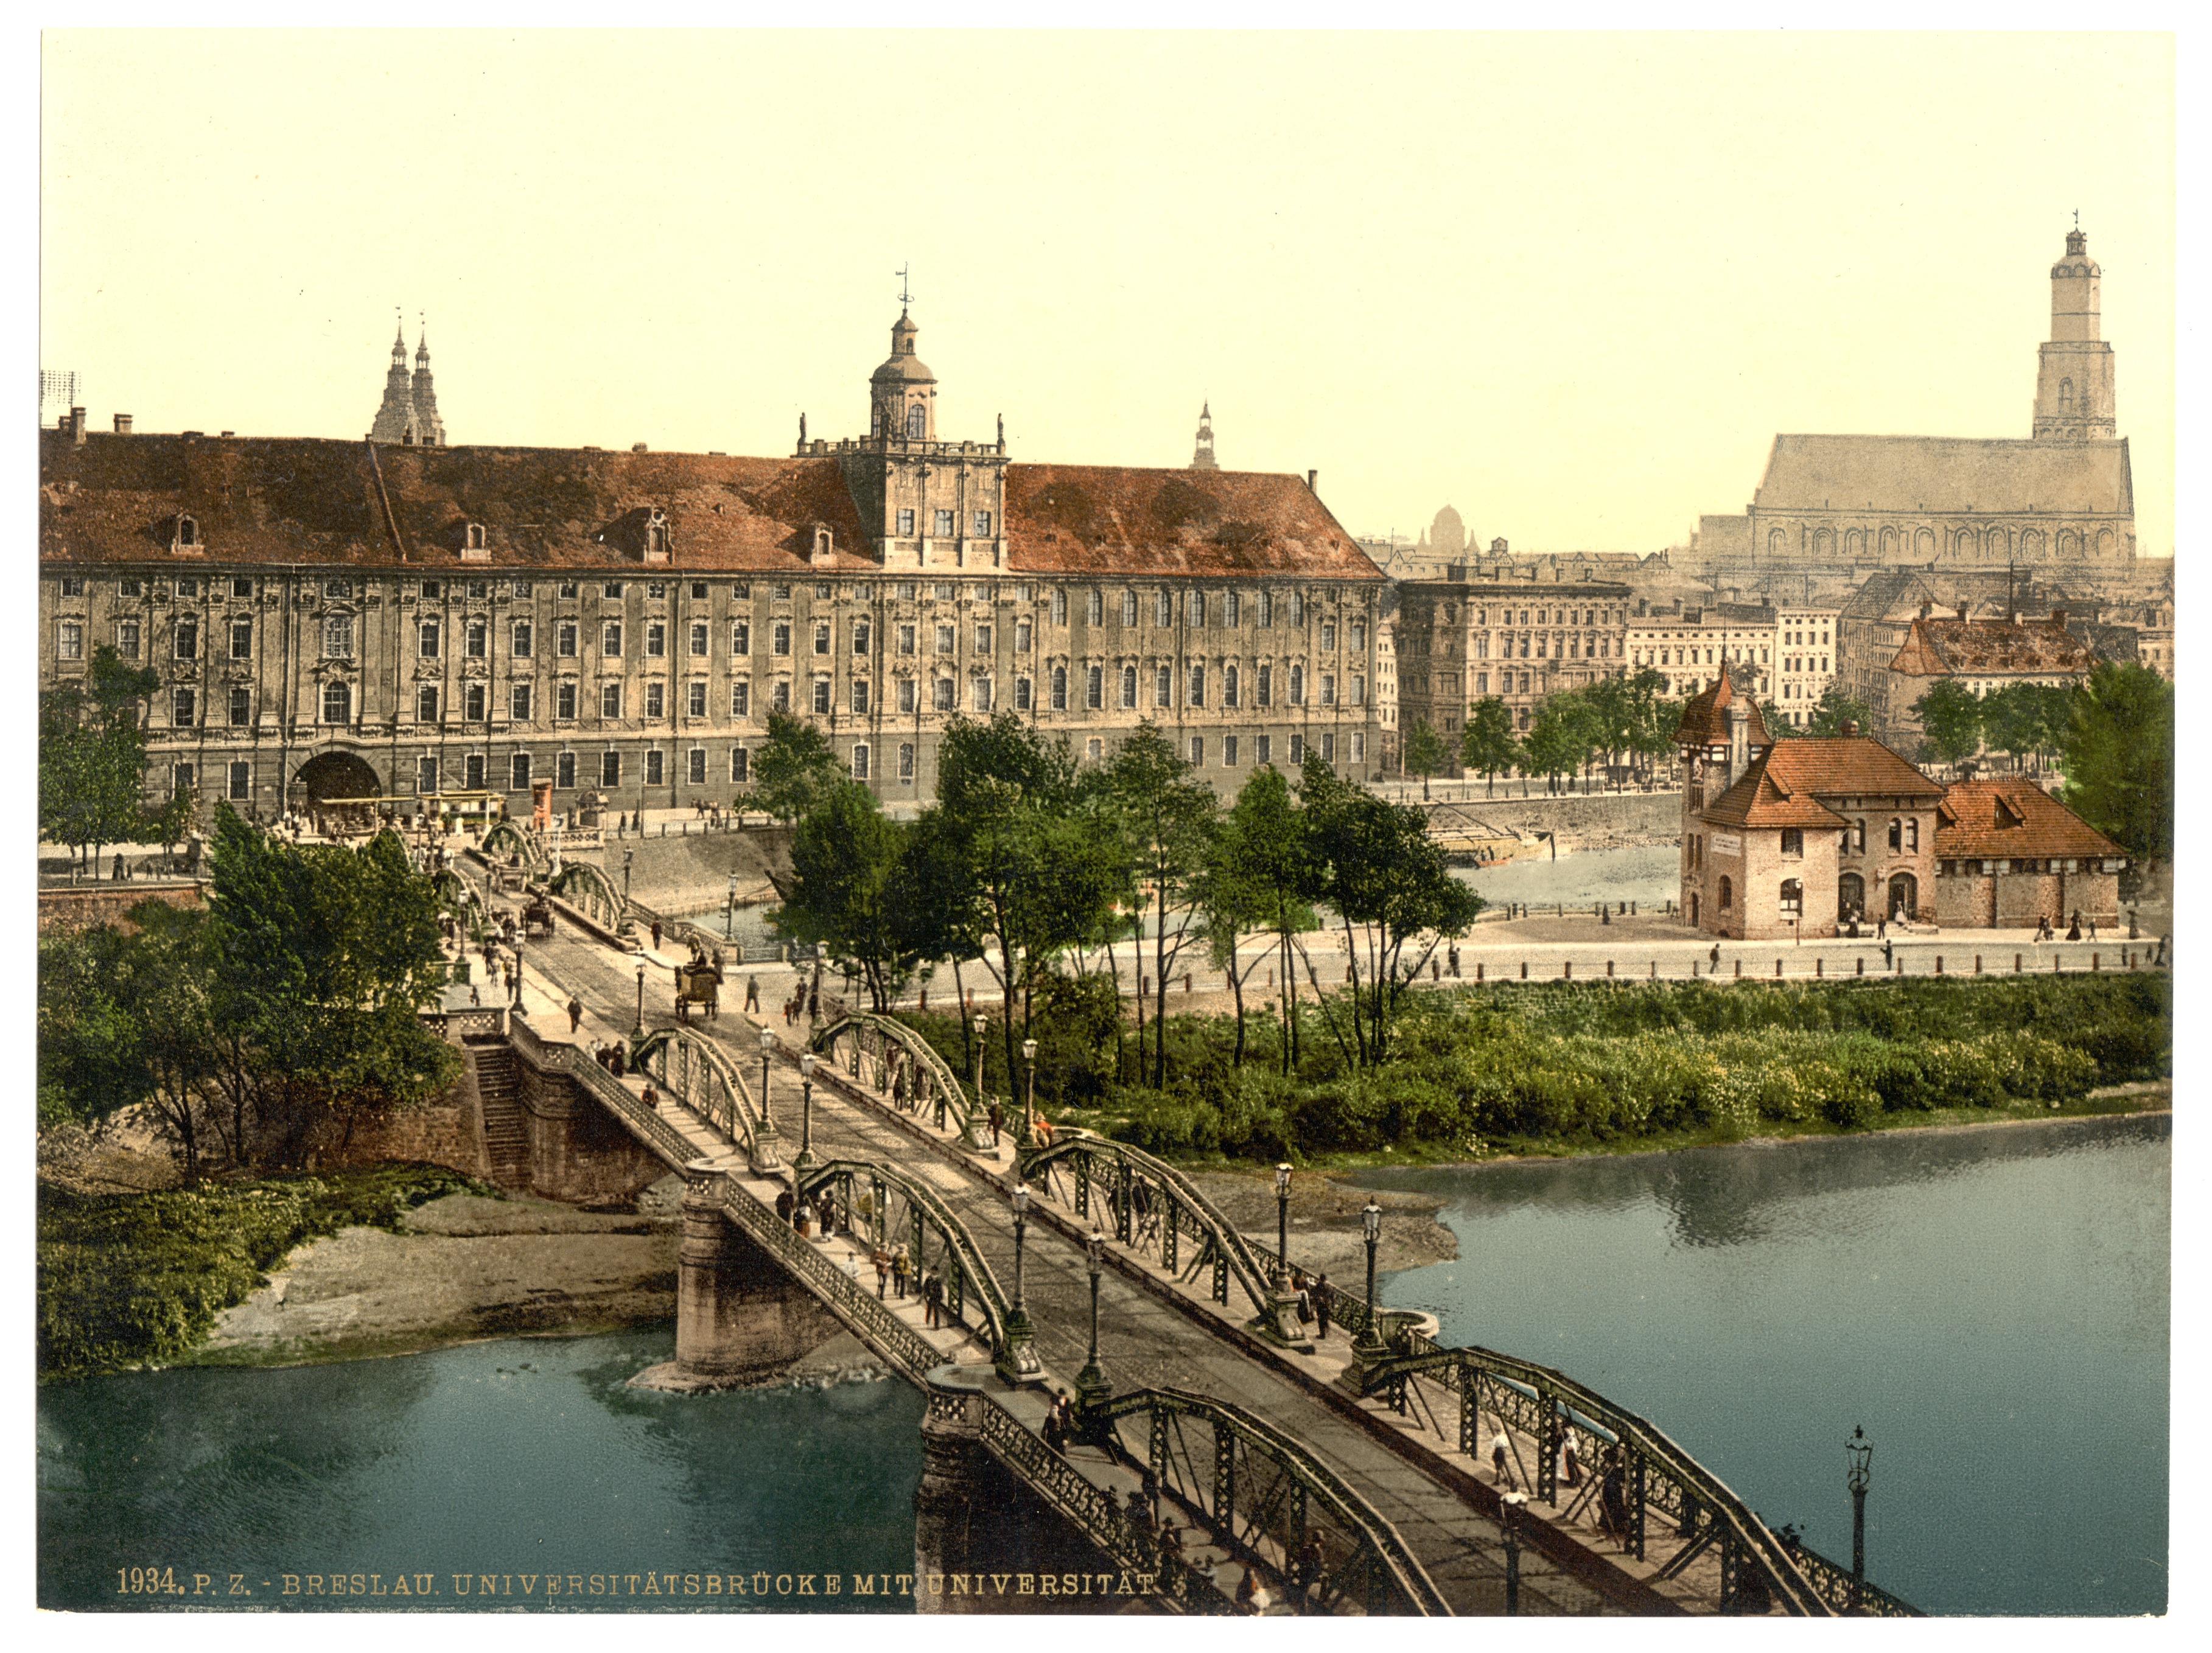 https://upload.wikimedia.org/wikipedia/commons/8/88/University_with_bridge%2C_Breslau%2C_Silesia%2C_Germany_%28i.e.%2C_Wroc%C5%82aw%2C_Poland%29-LCCN2002720686.jpg